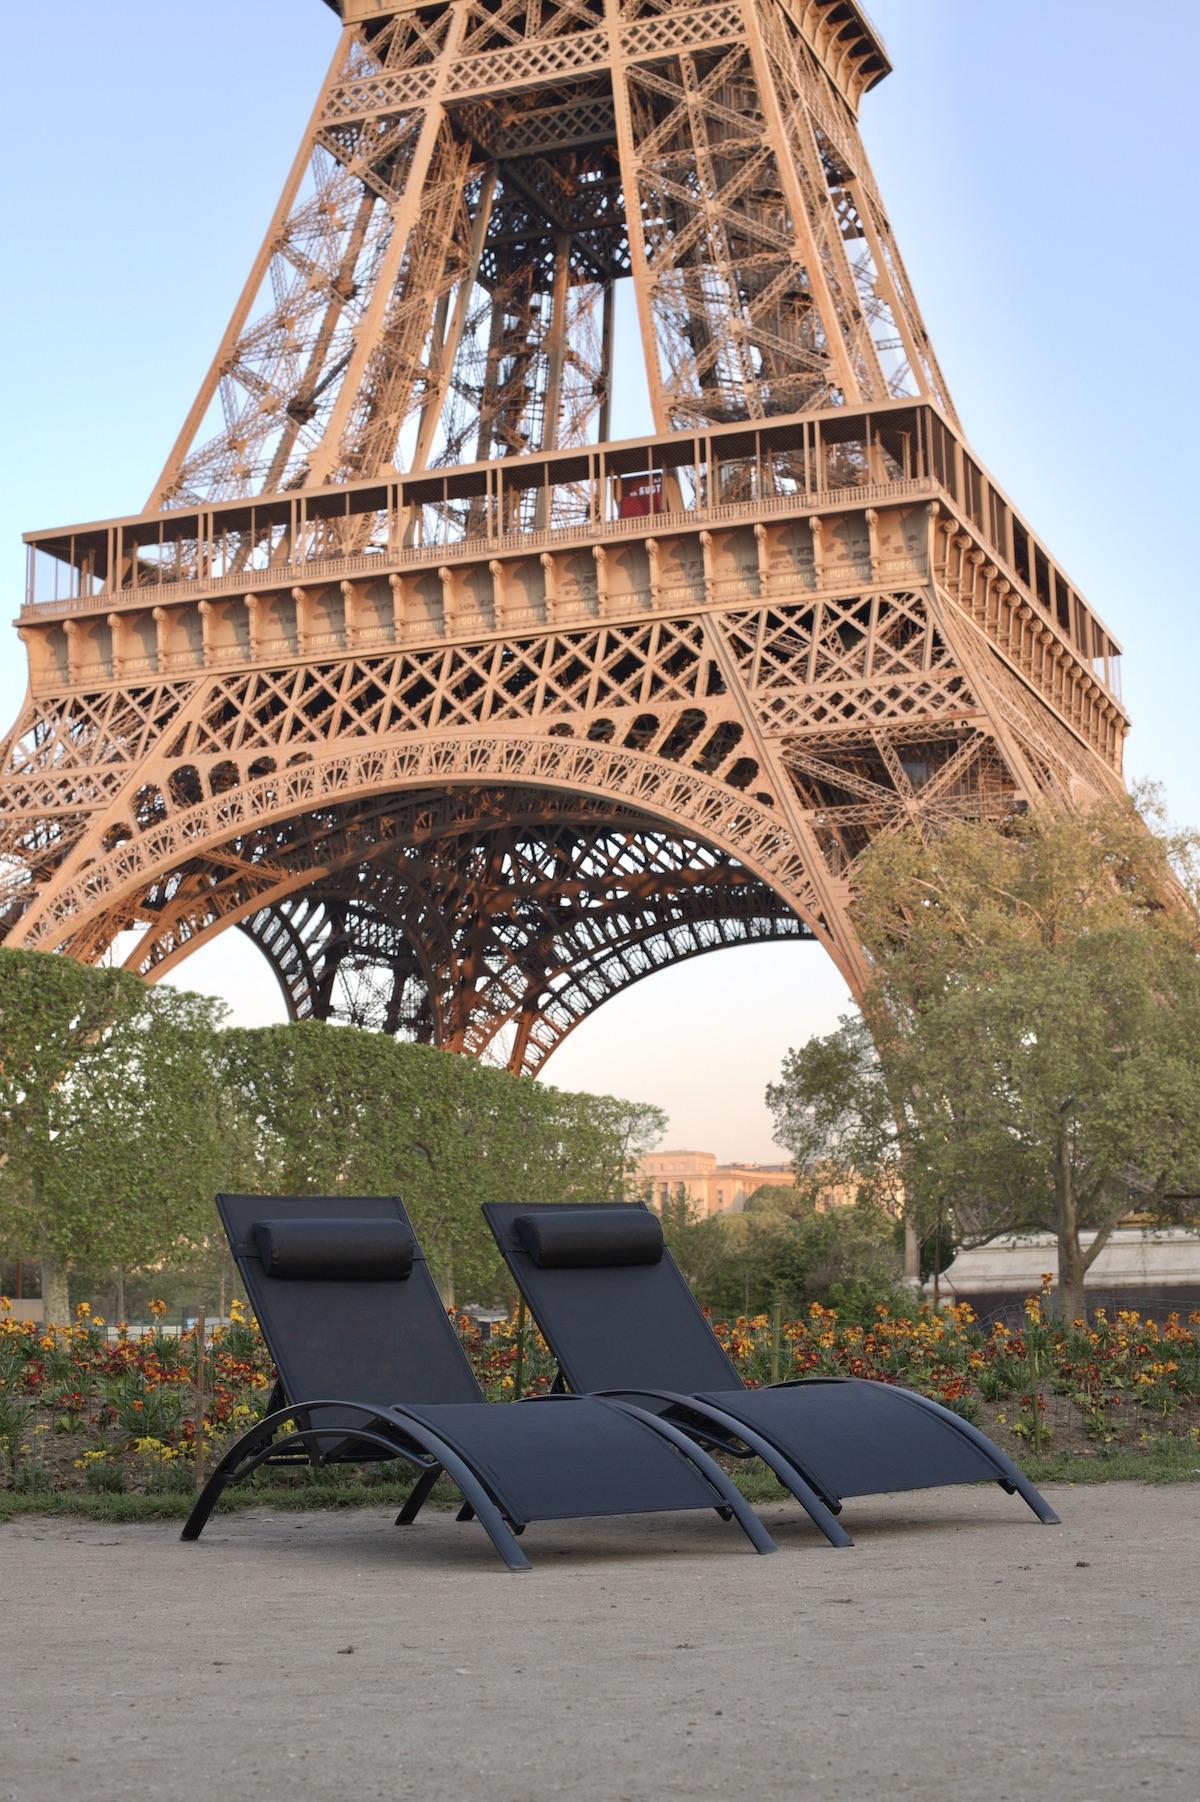 transat terrasse paris confortable design - blog déco - clem around the corner